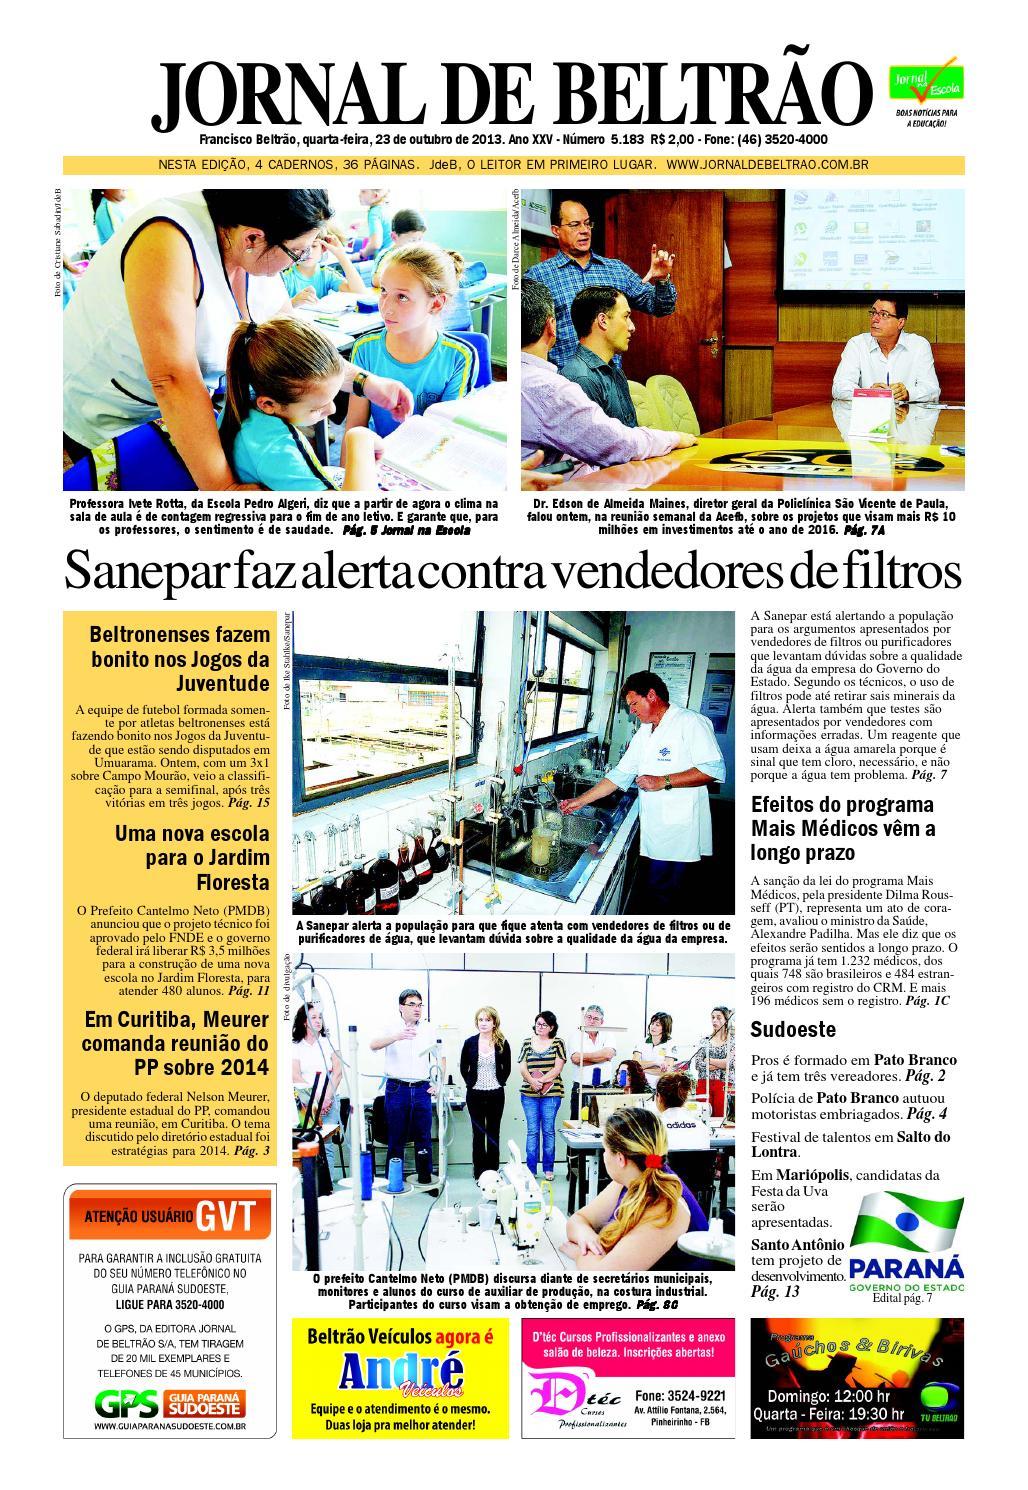 Jornaldebeltrao 5182 23-10-2013.pdf by Orangotoe - issuu 5958a80dadfc7